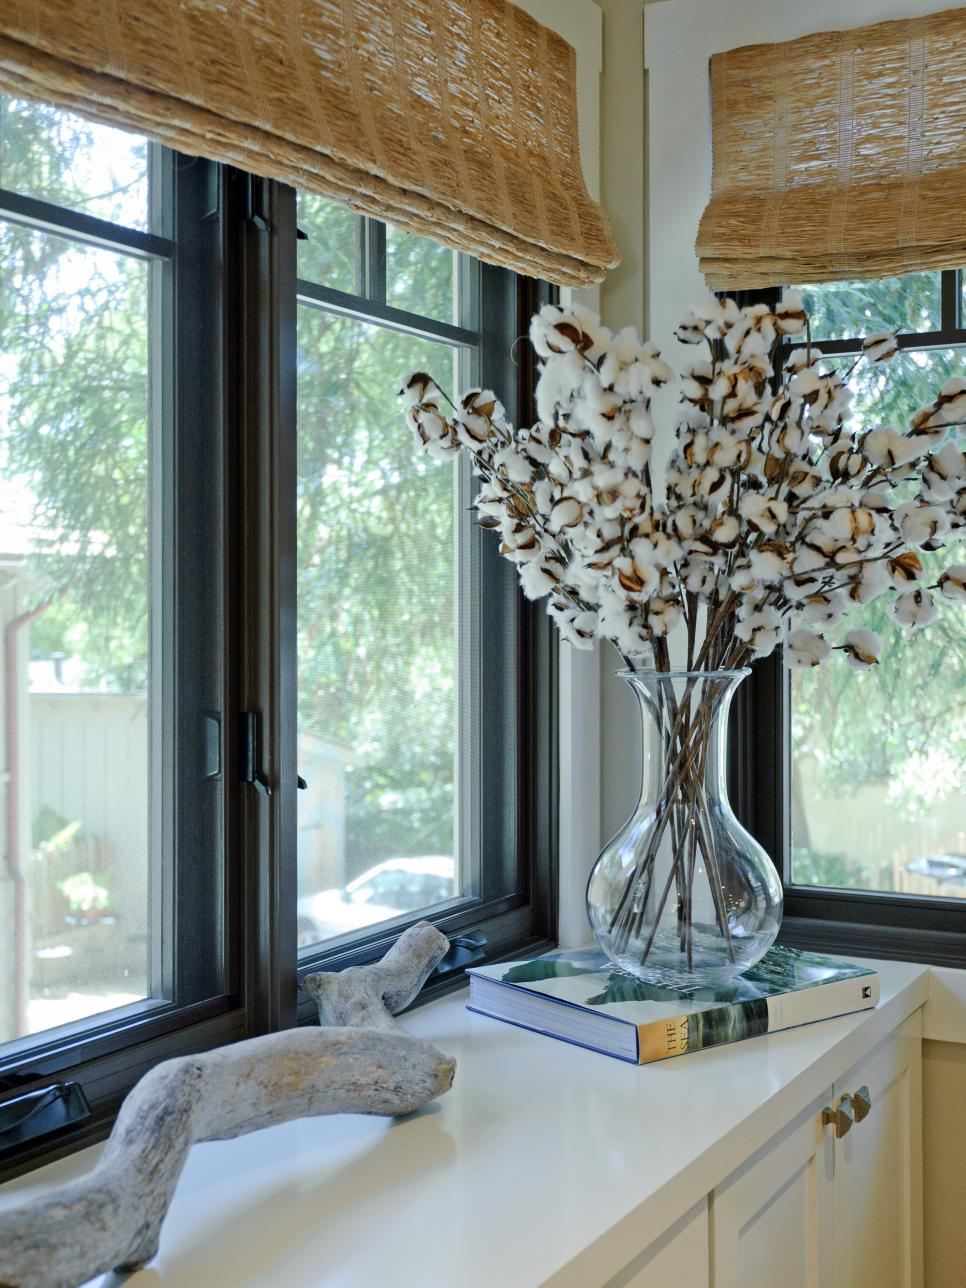 Оформление кухонного окна в стиле эко